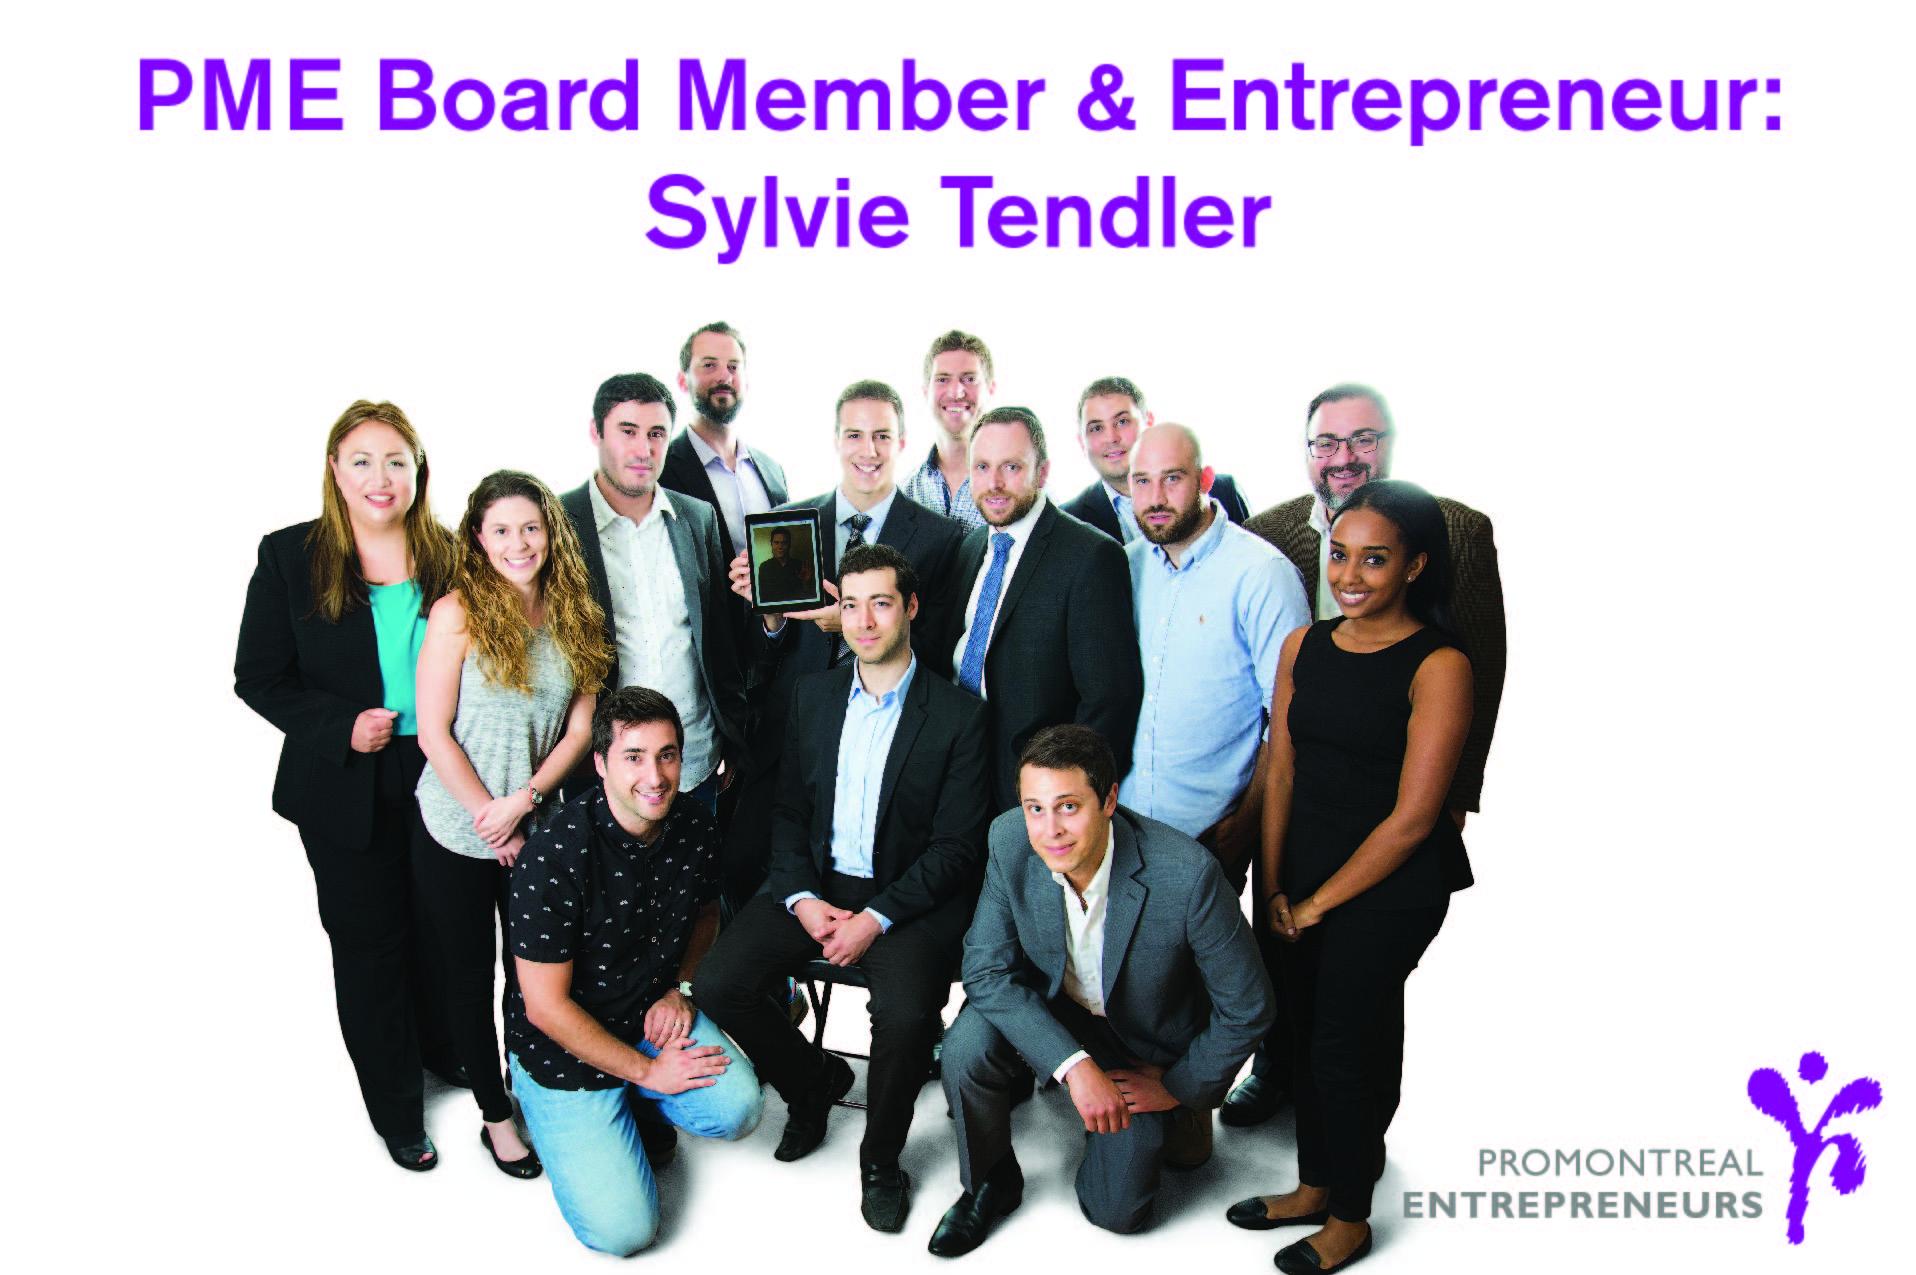 promontreal entrepreneurs